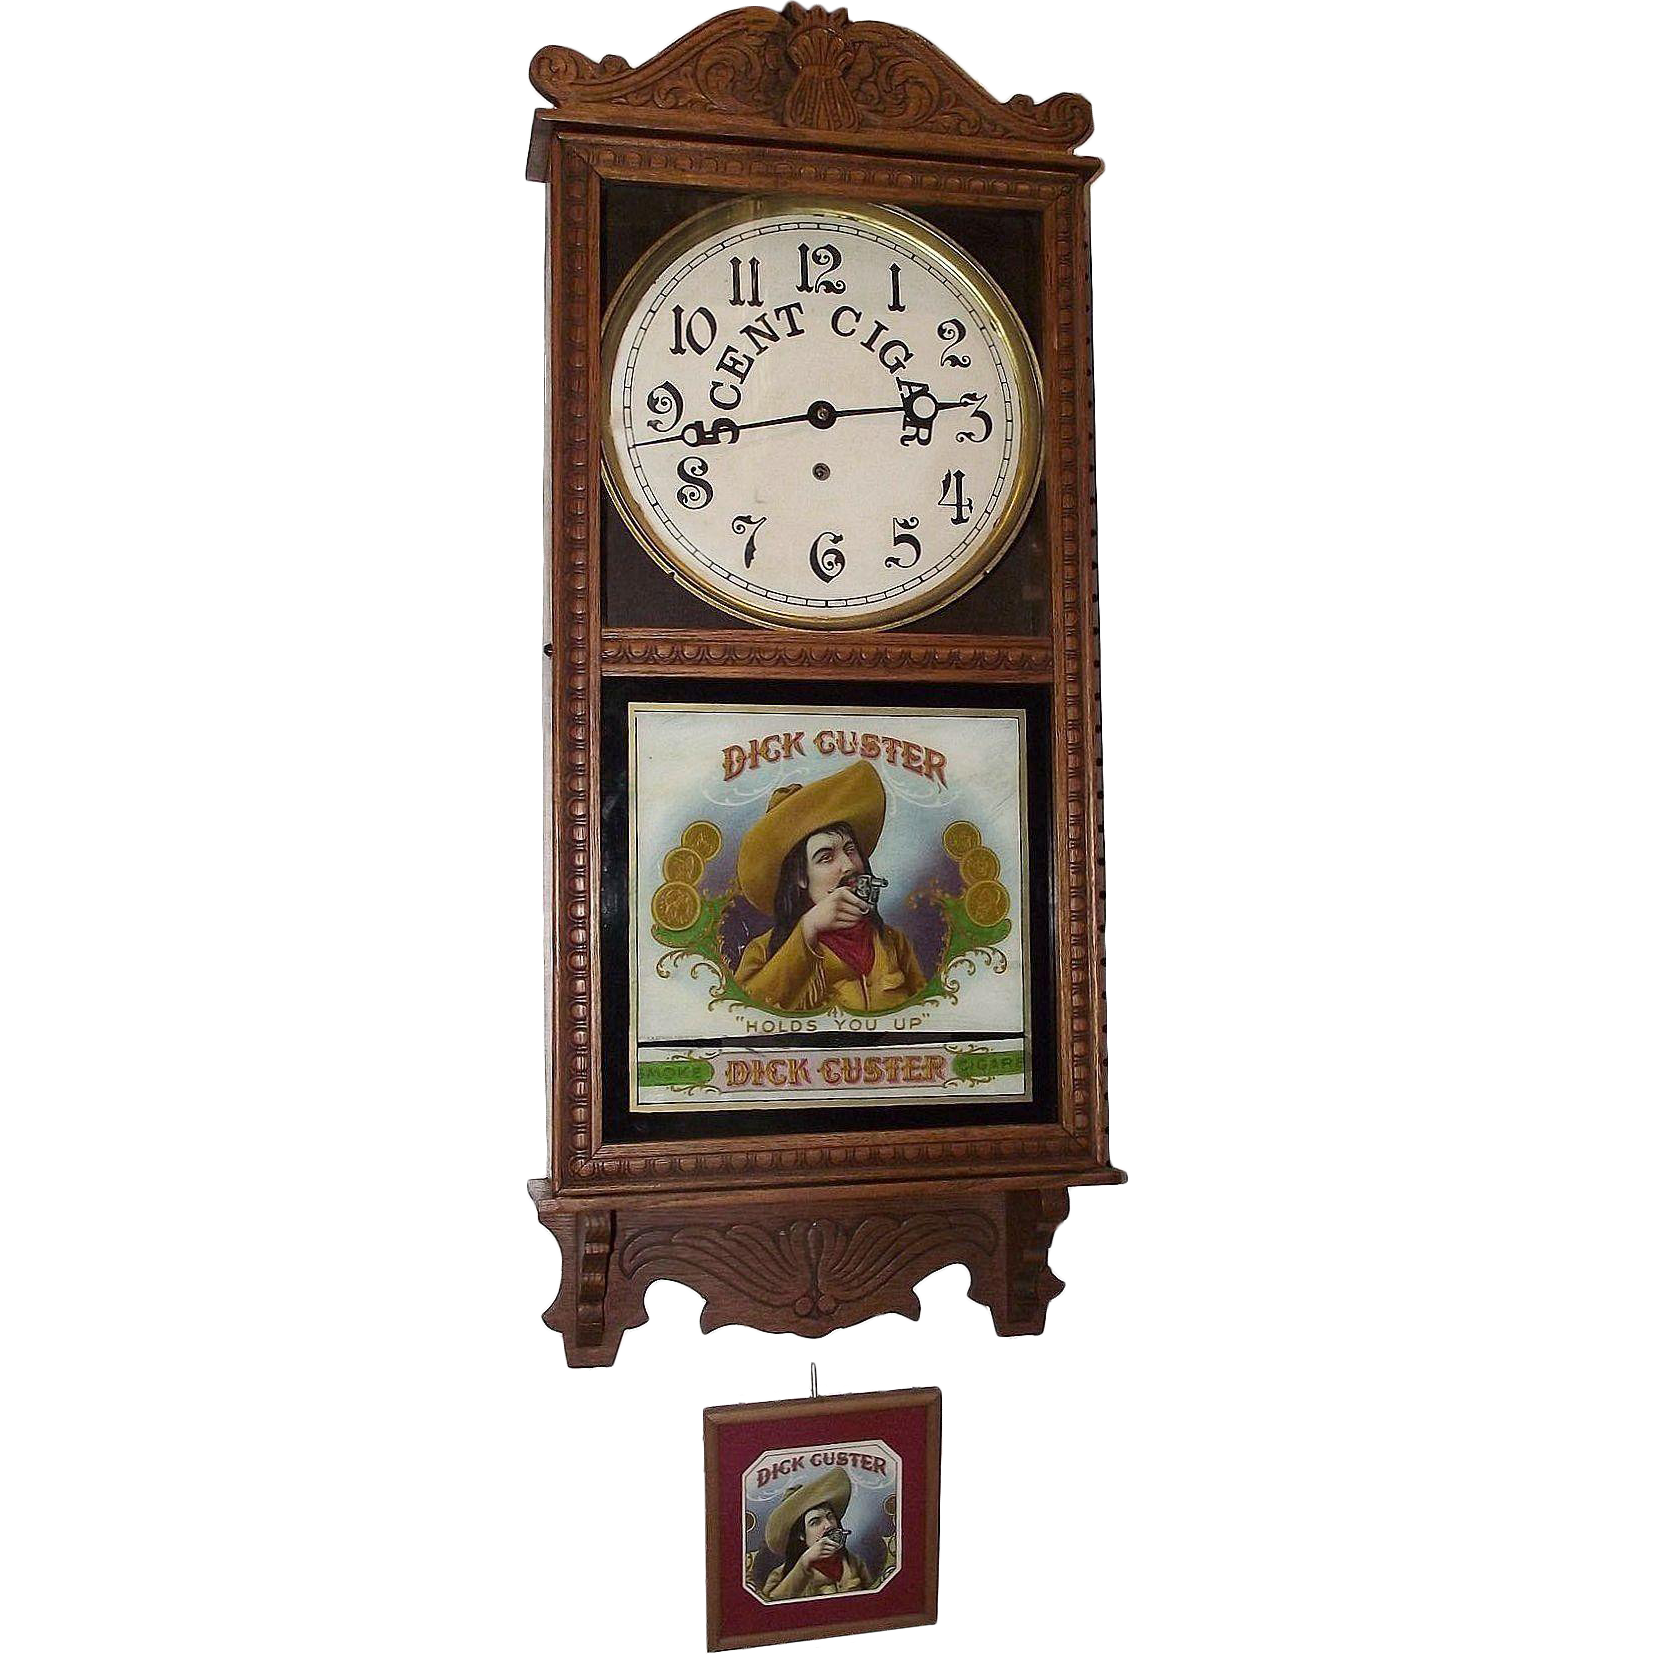 Dick custer cigar store advertising clock made by circa 1910s to dick custer cigar store advertising clock made by circa 1910s to 1920s amipublicfo Choice Image